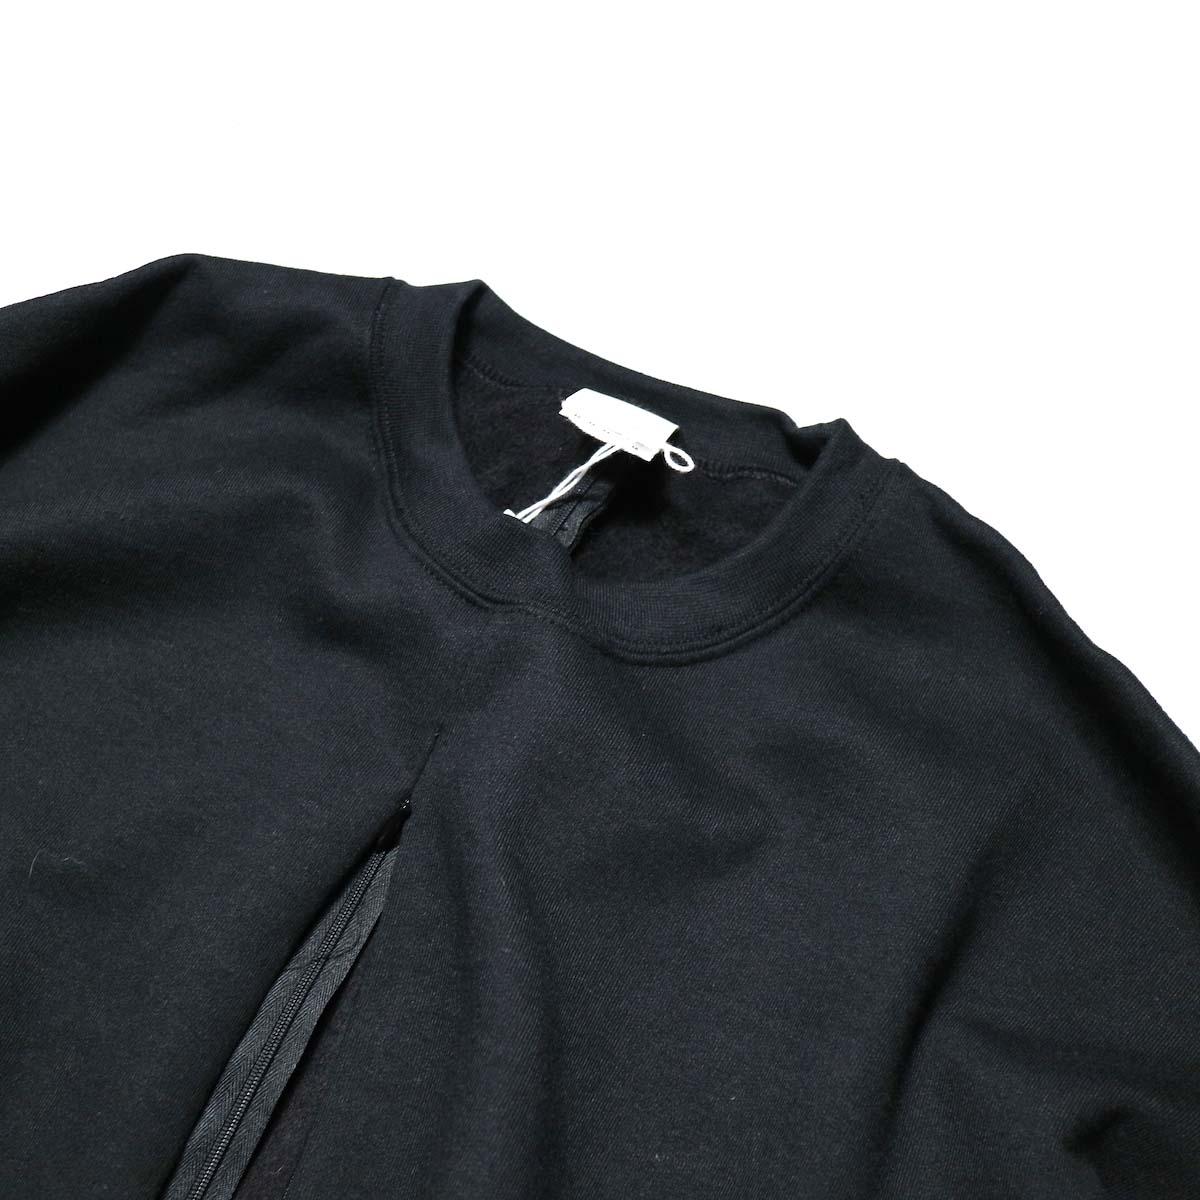 PRE_ / F&B OPEN SWEAT (Black)クルーネック